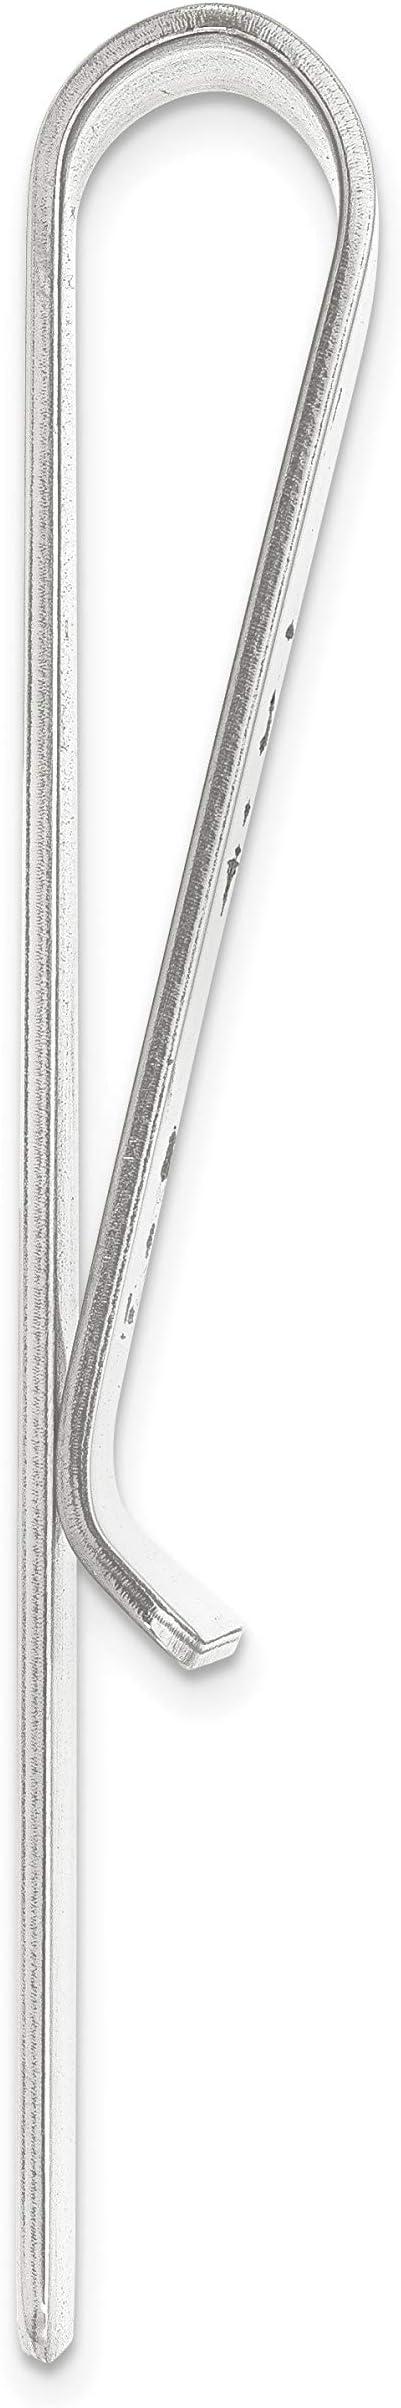 Polished /& Laser Designed Brilliant Bijou Men/'s Recess Letters Monogram Money Clip Personalized